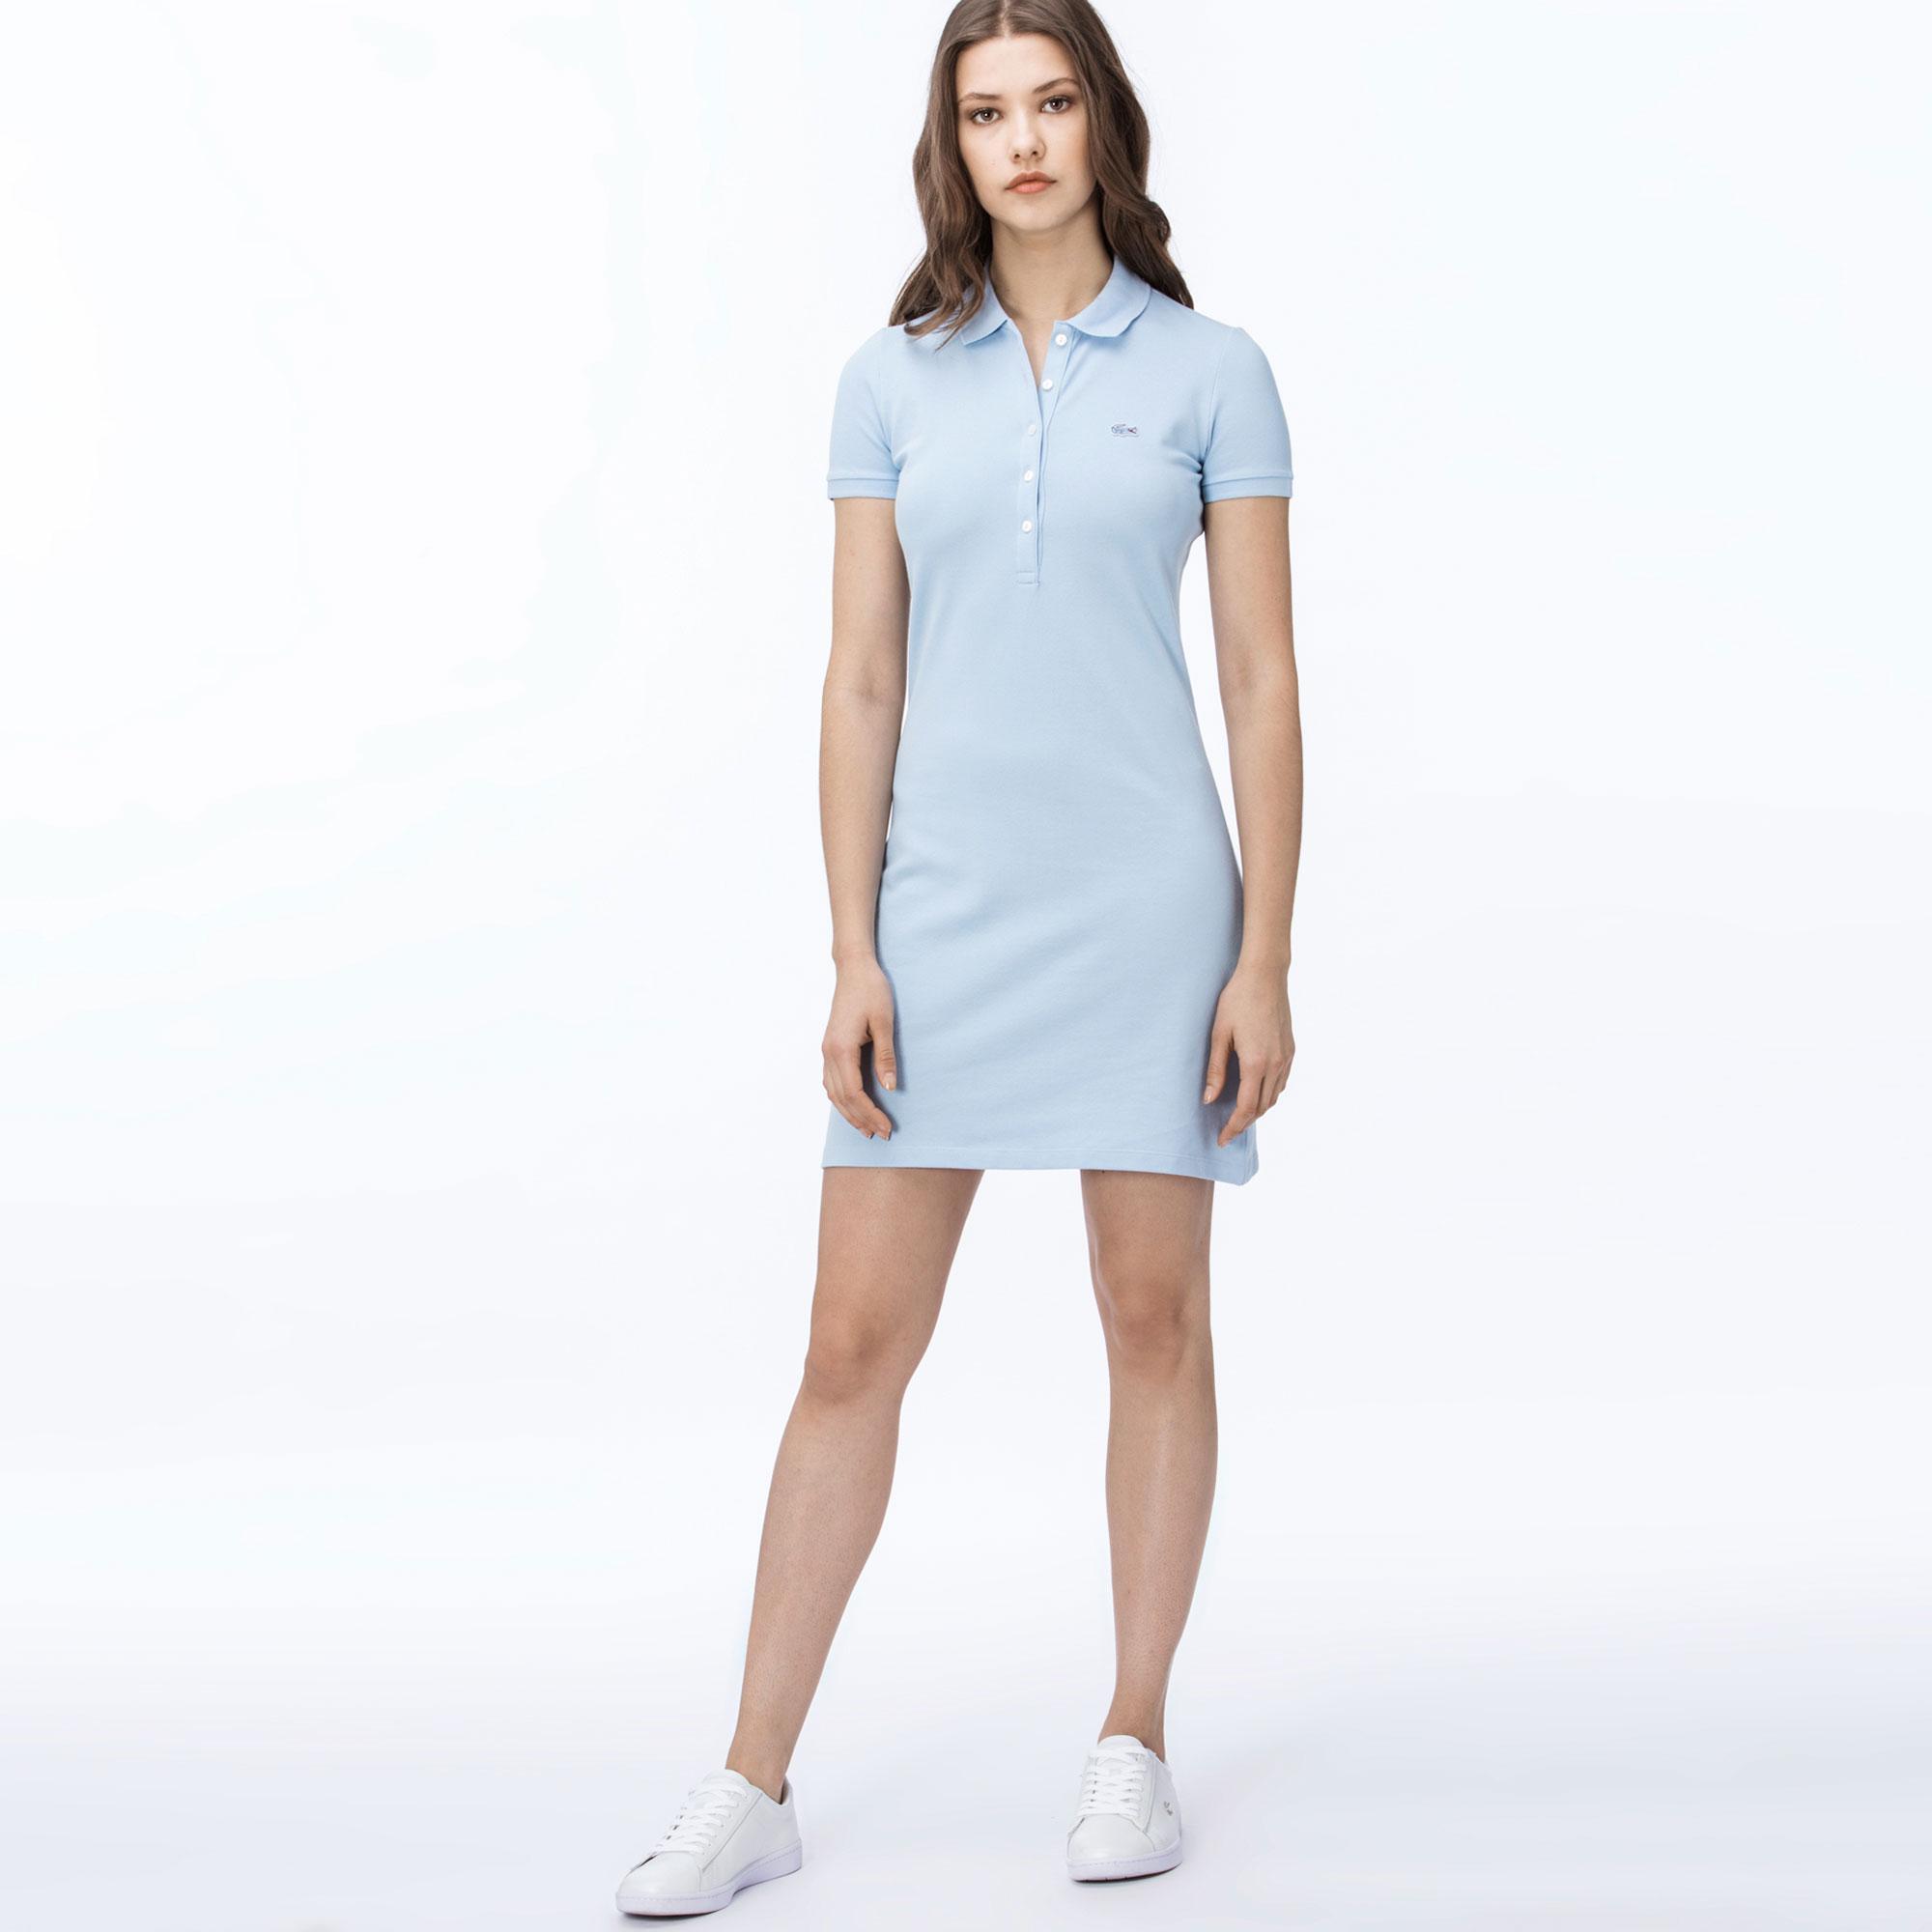 Платье LacosteПлатья и юбки<br>94% хлопок 6% эластан